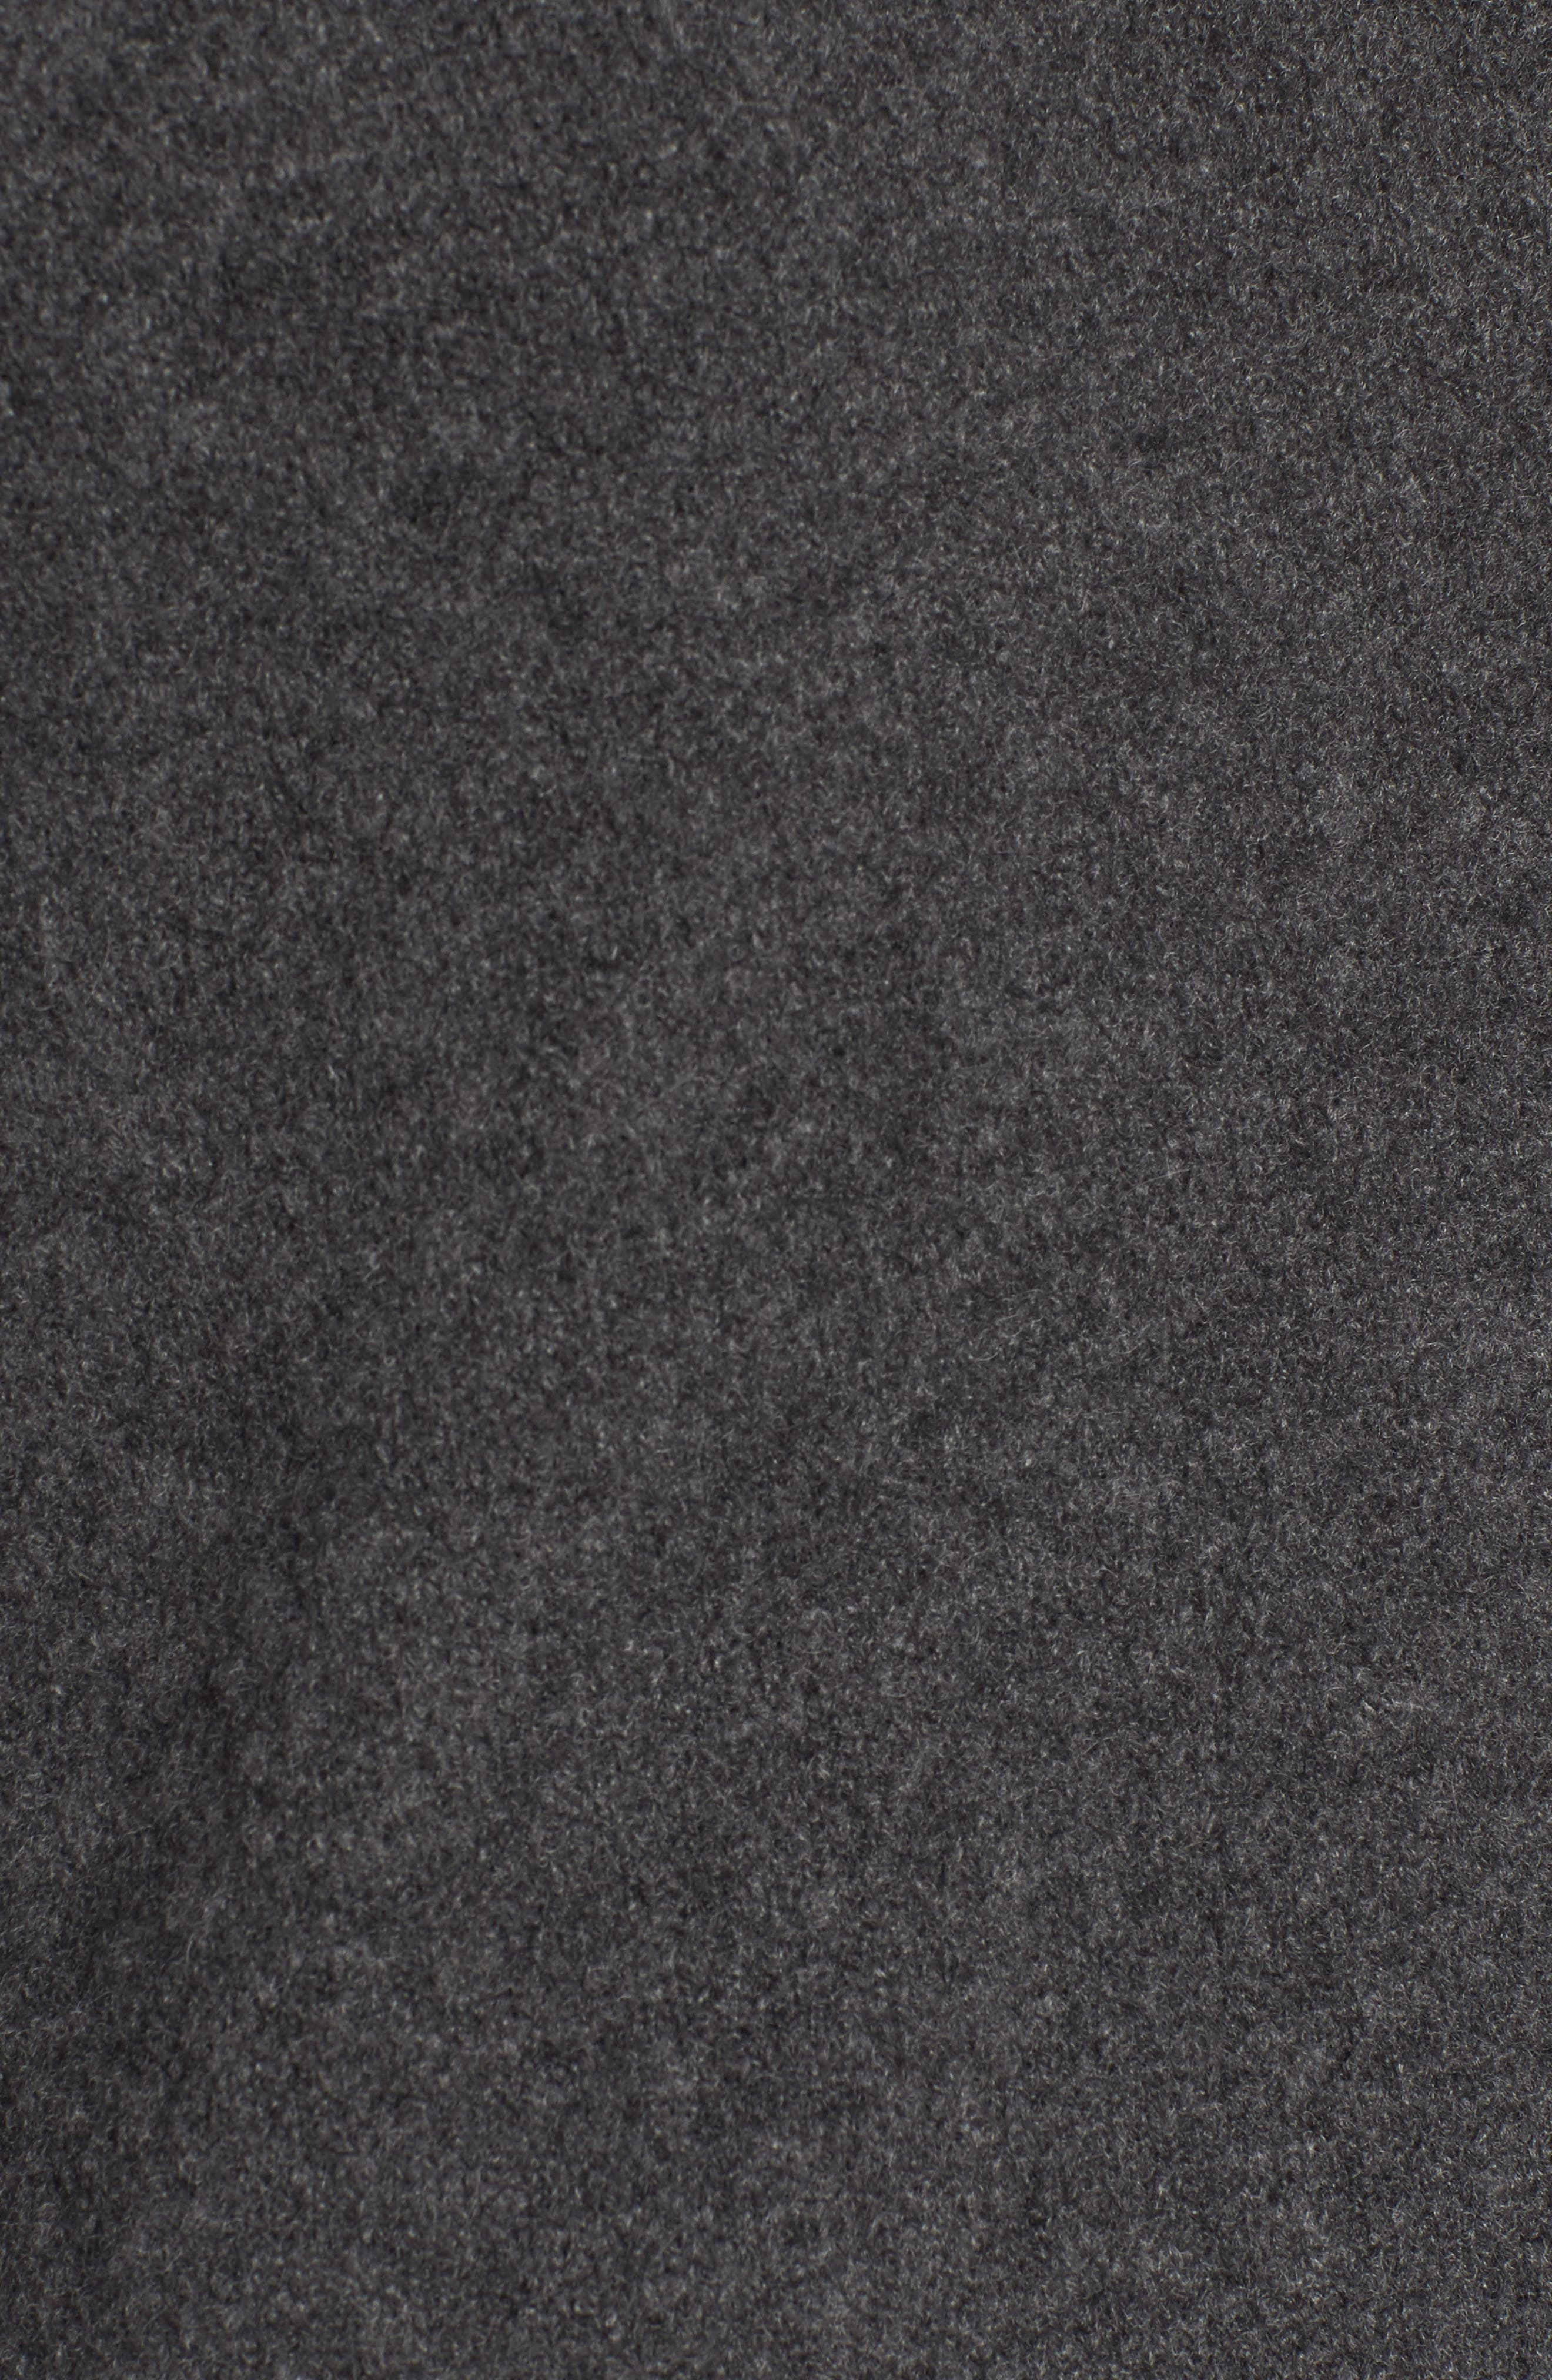 Stretch Cashmere Mock Neck Sweater,                             Alternate thumbnail 5, color,                             069